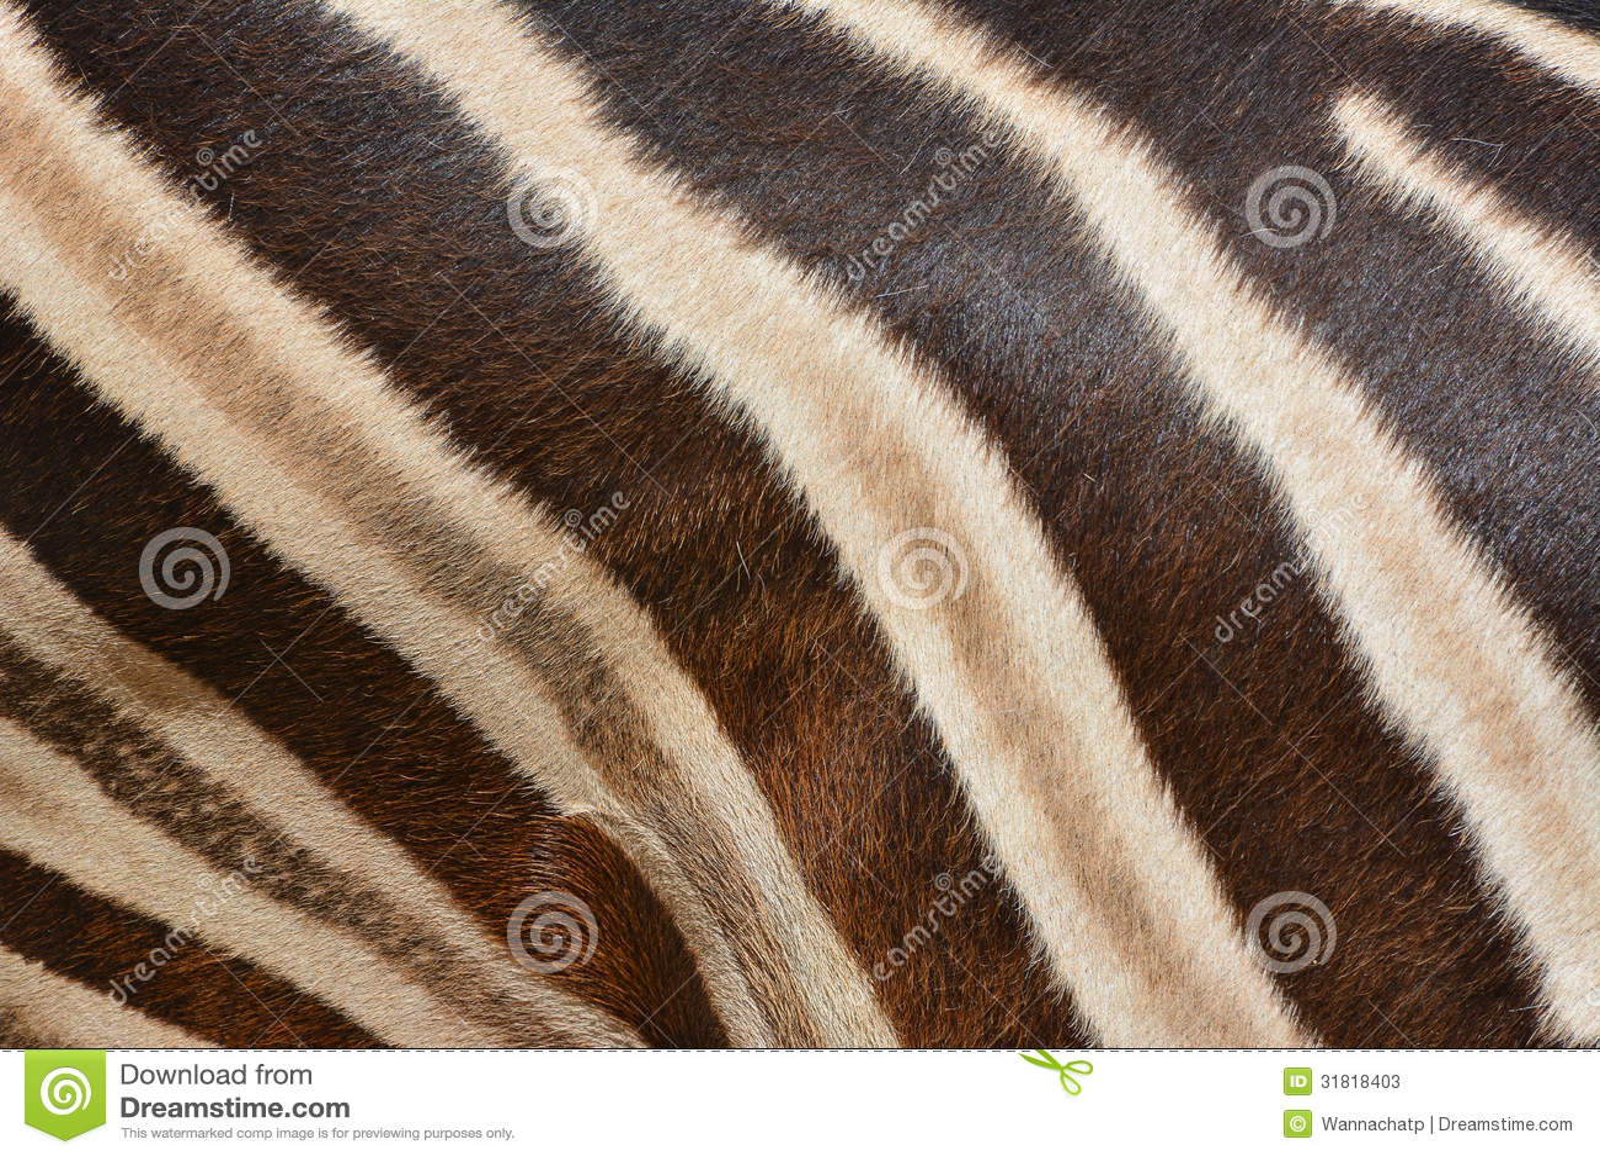 Real zebra pattern - photo#17